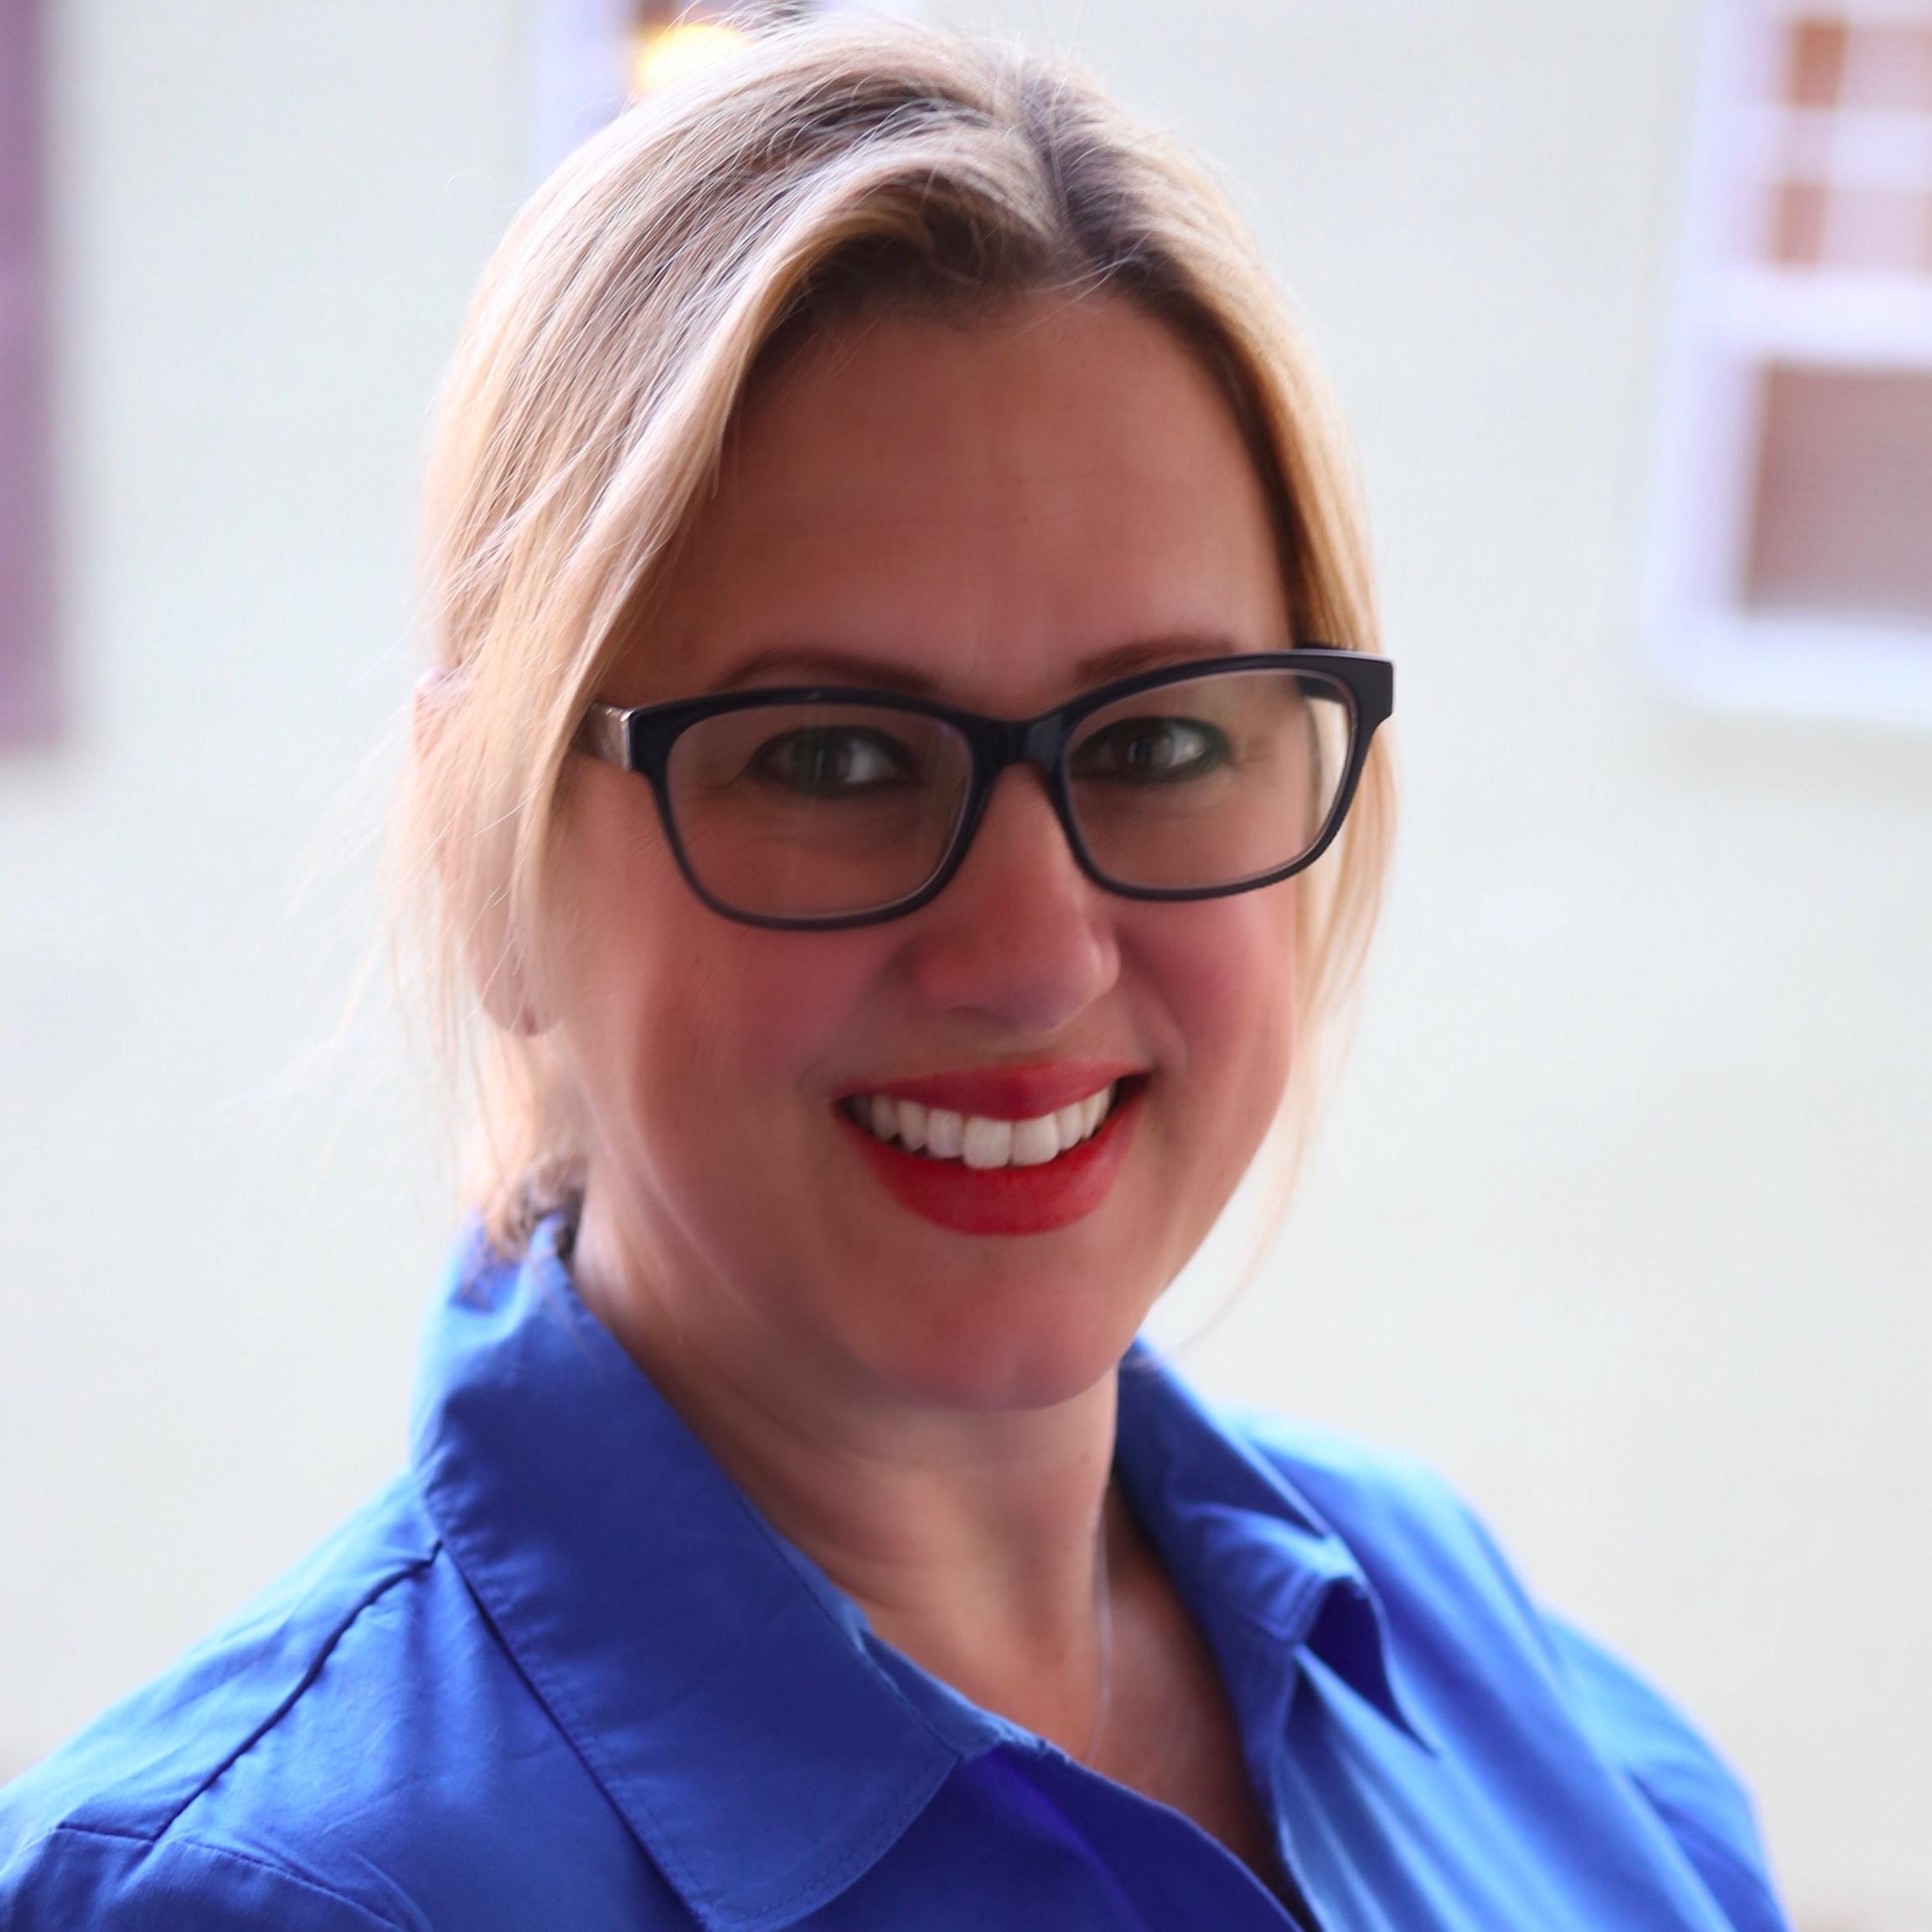 Katherine Ranta for School Board, Alexandria, VA,survivor of gun violence and domestic violence -